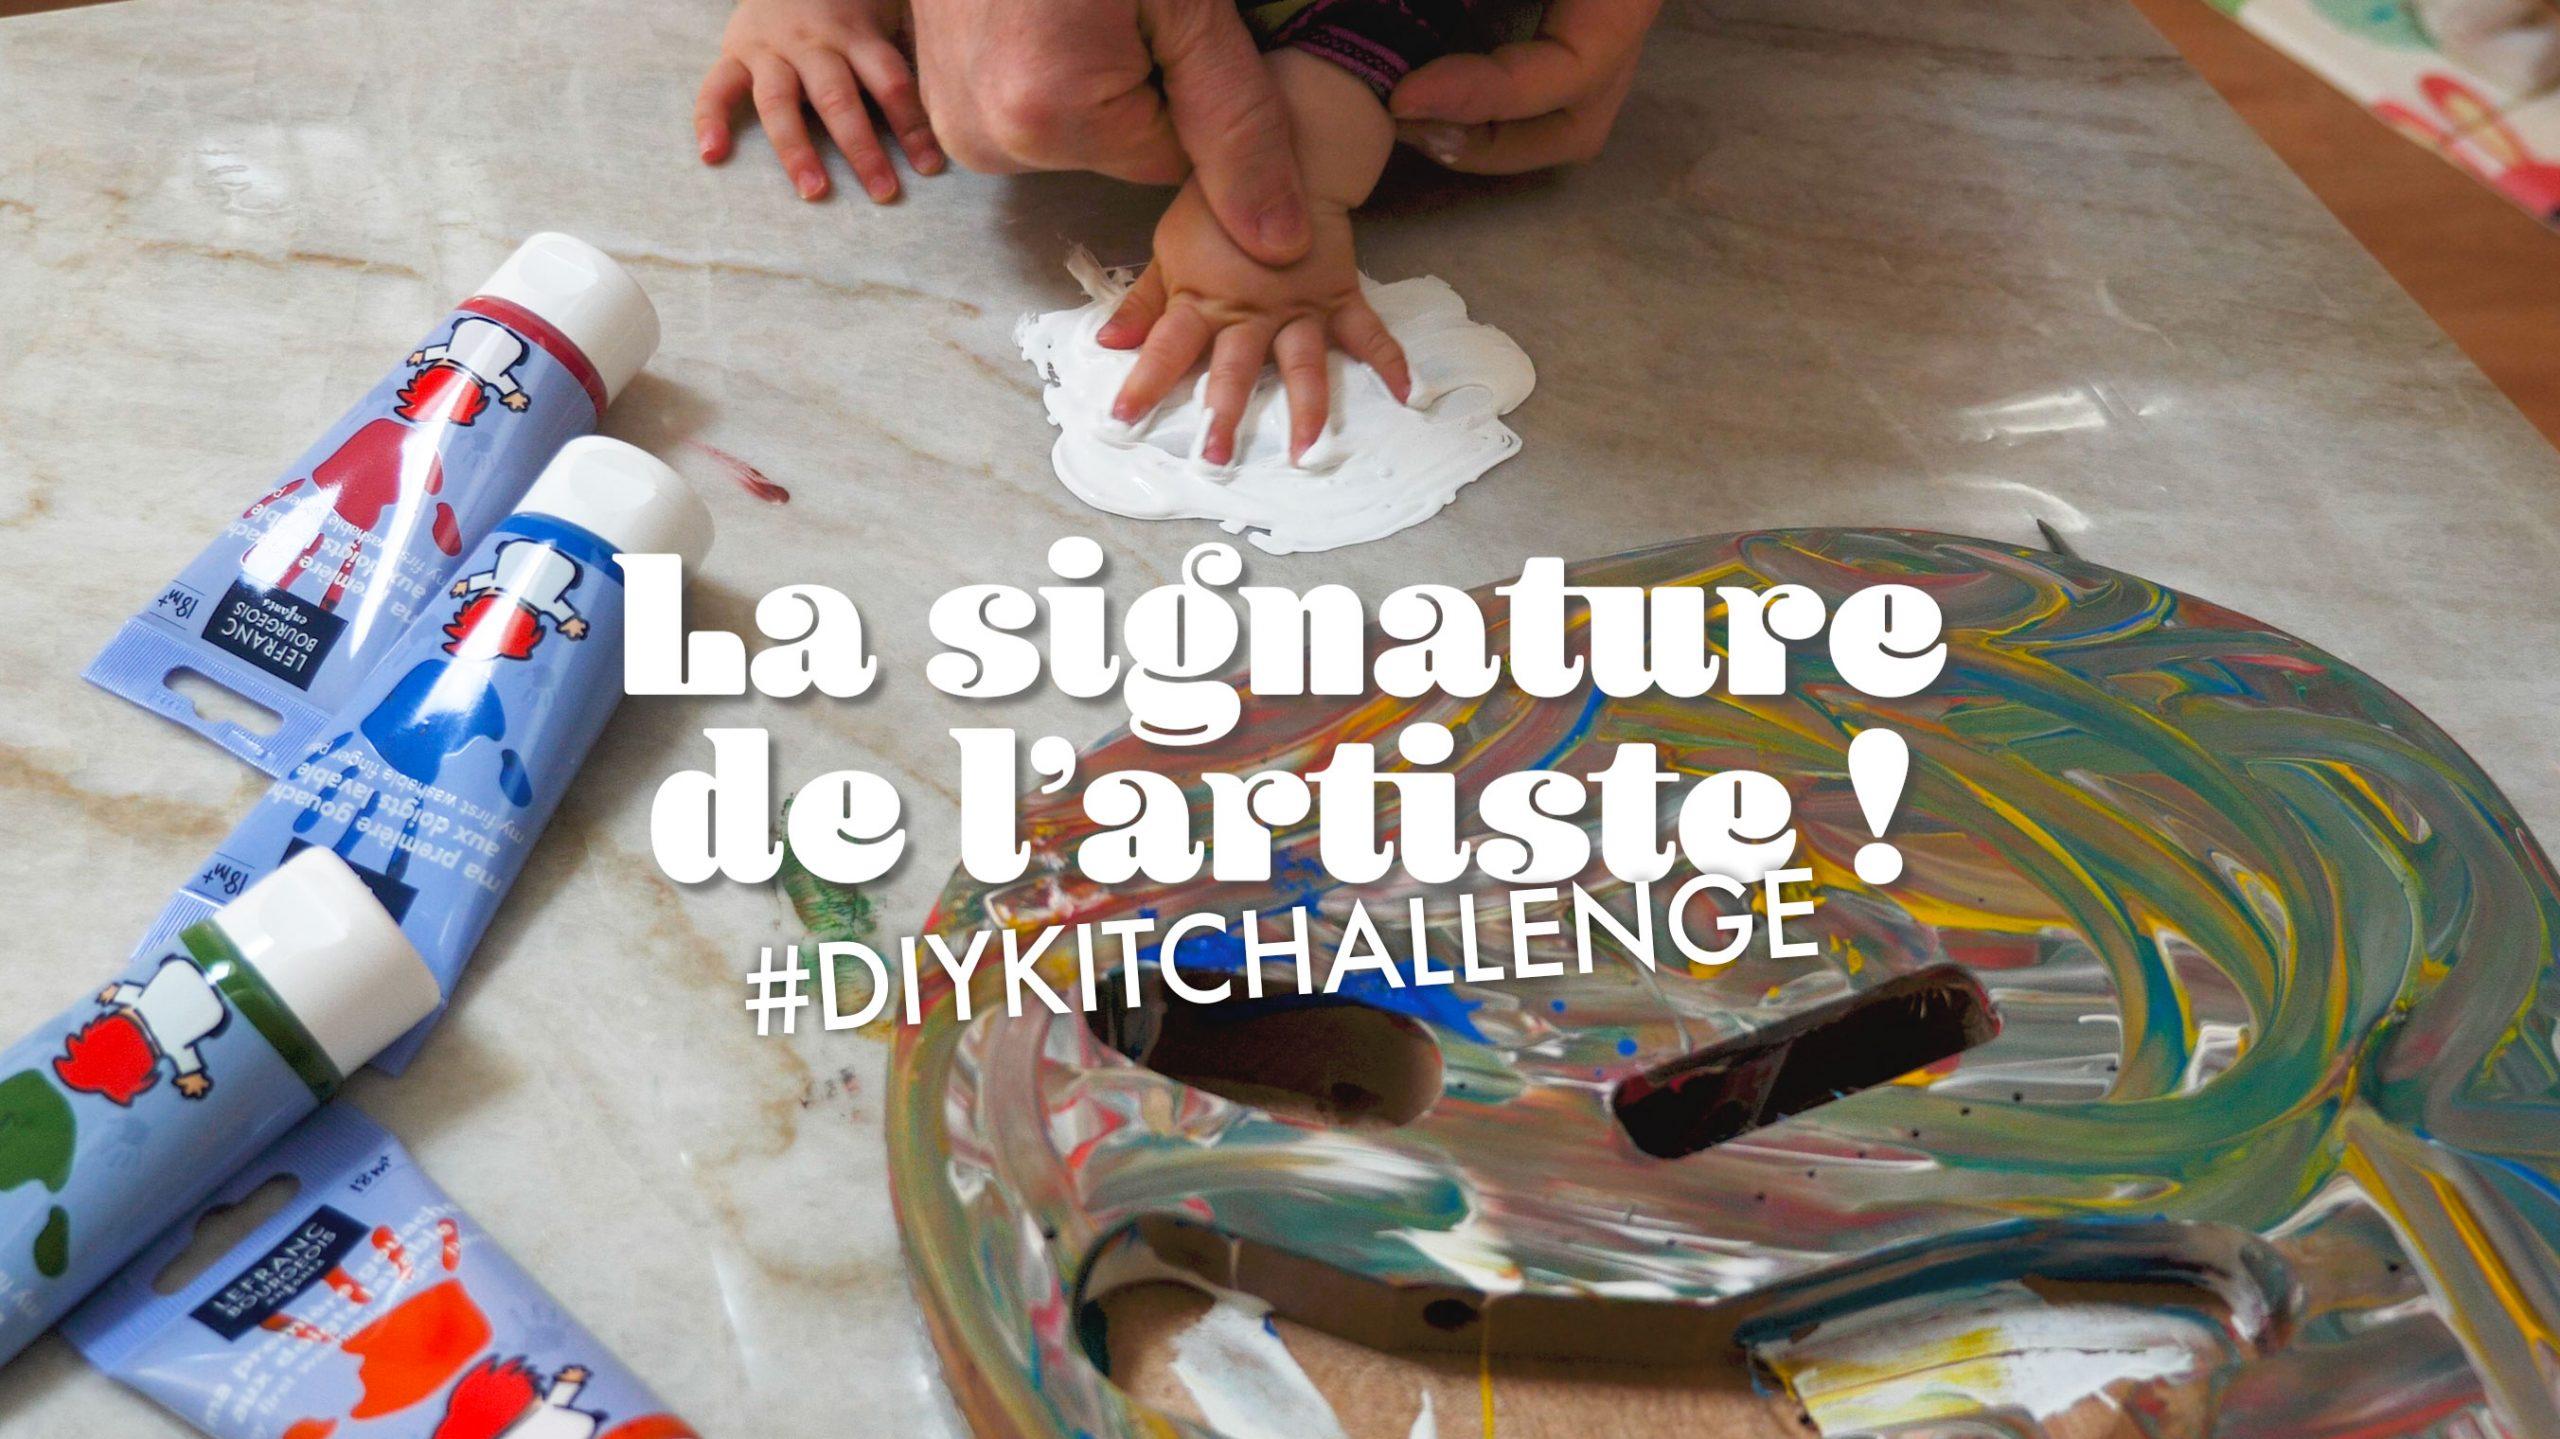 La signature de l'artiste ! #diykitchallenge